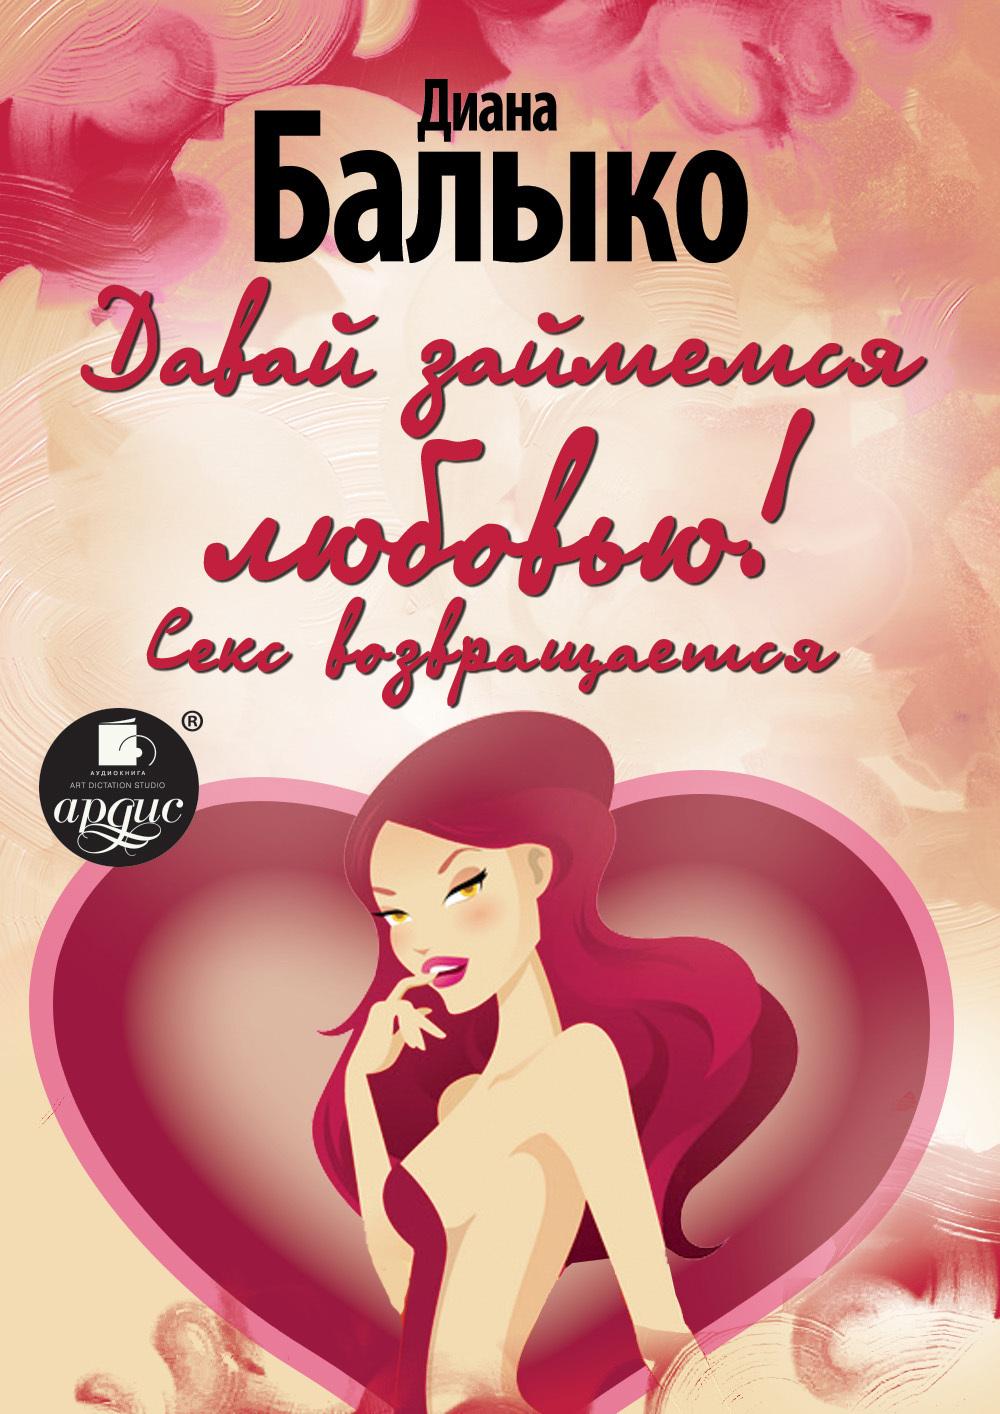 Диана Балыко бесплатно